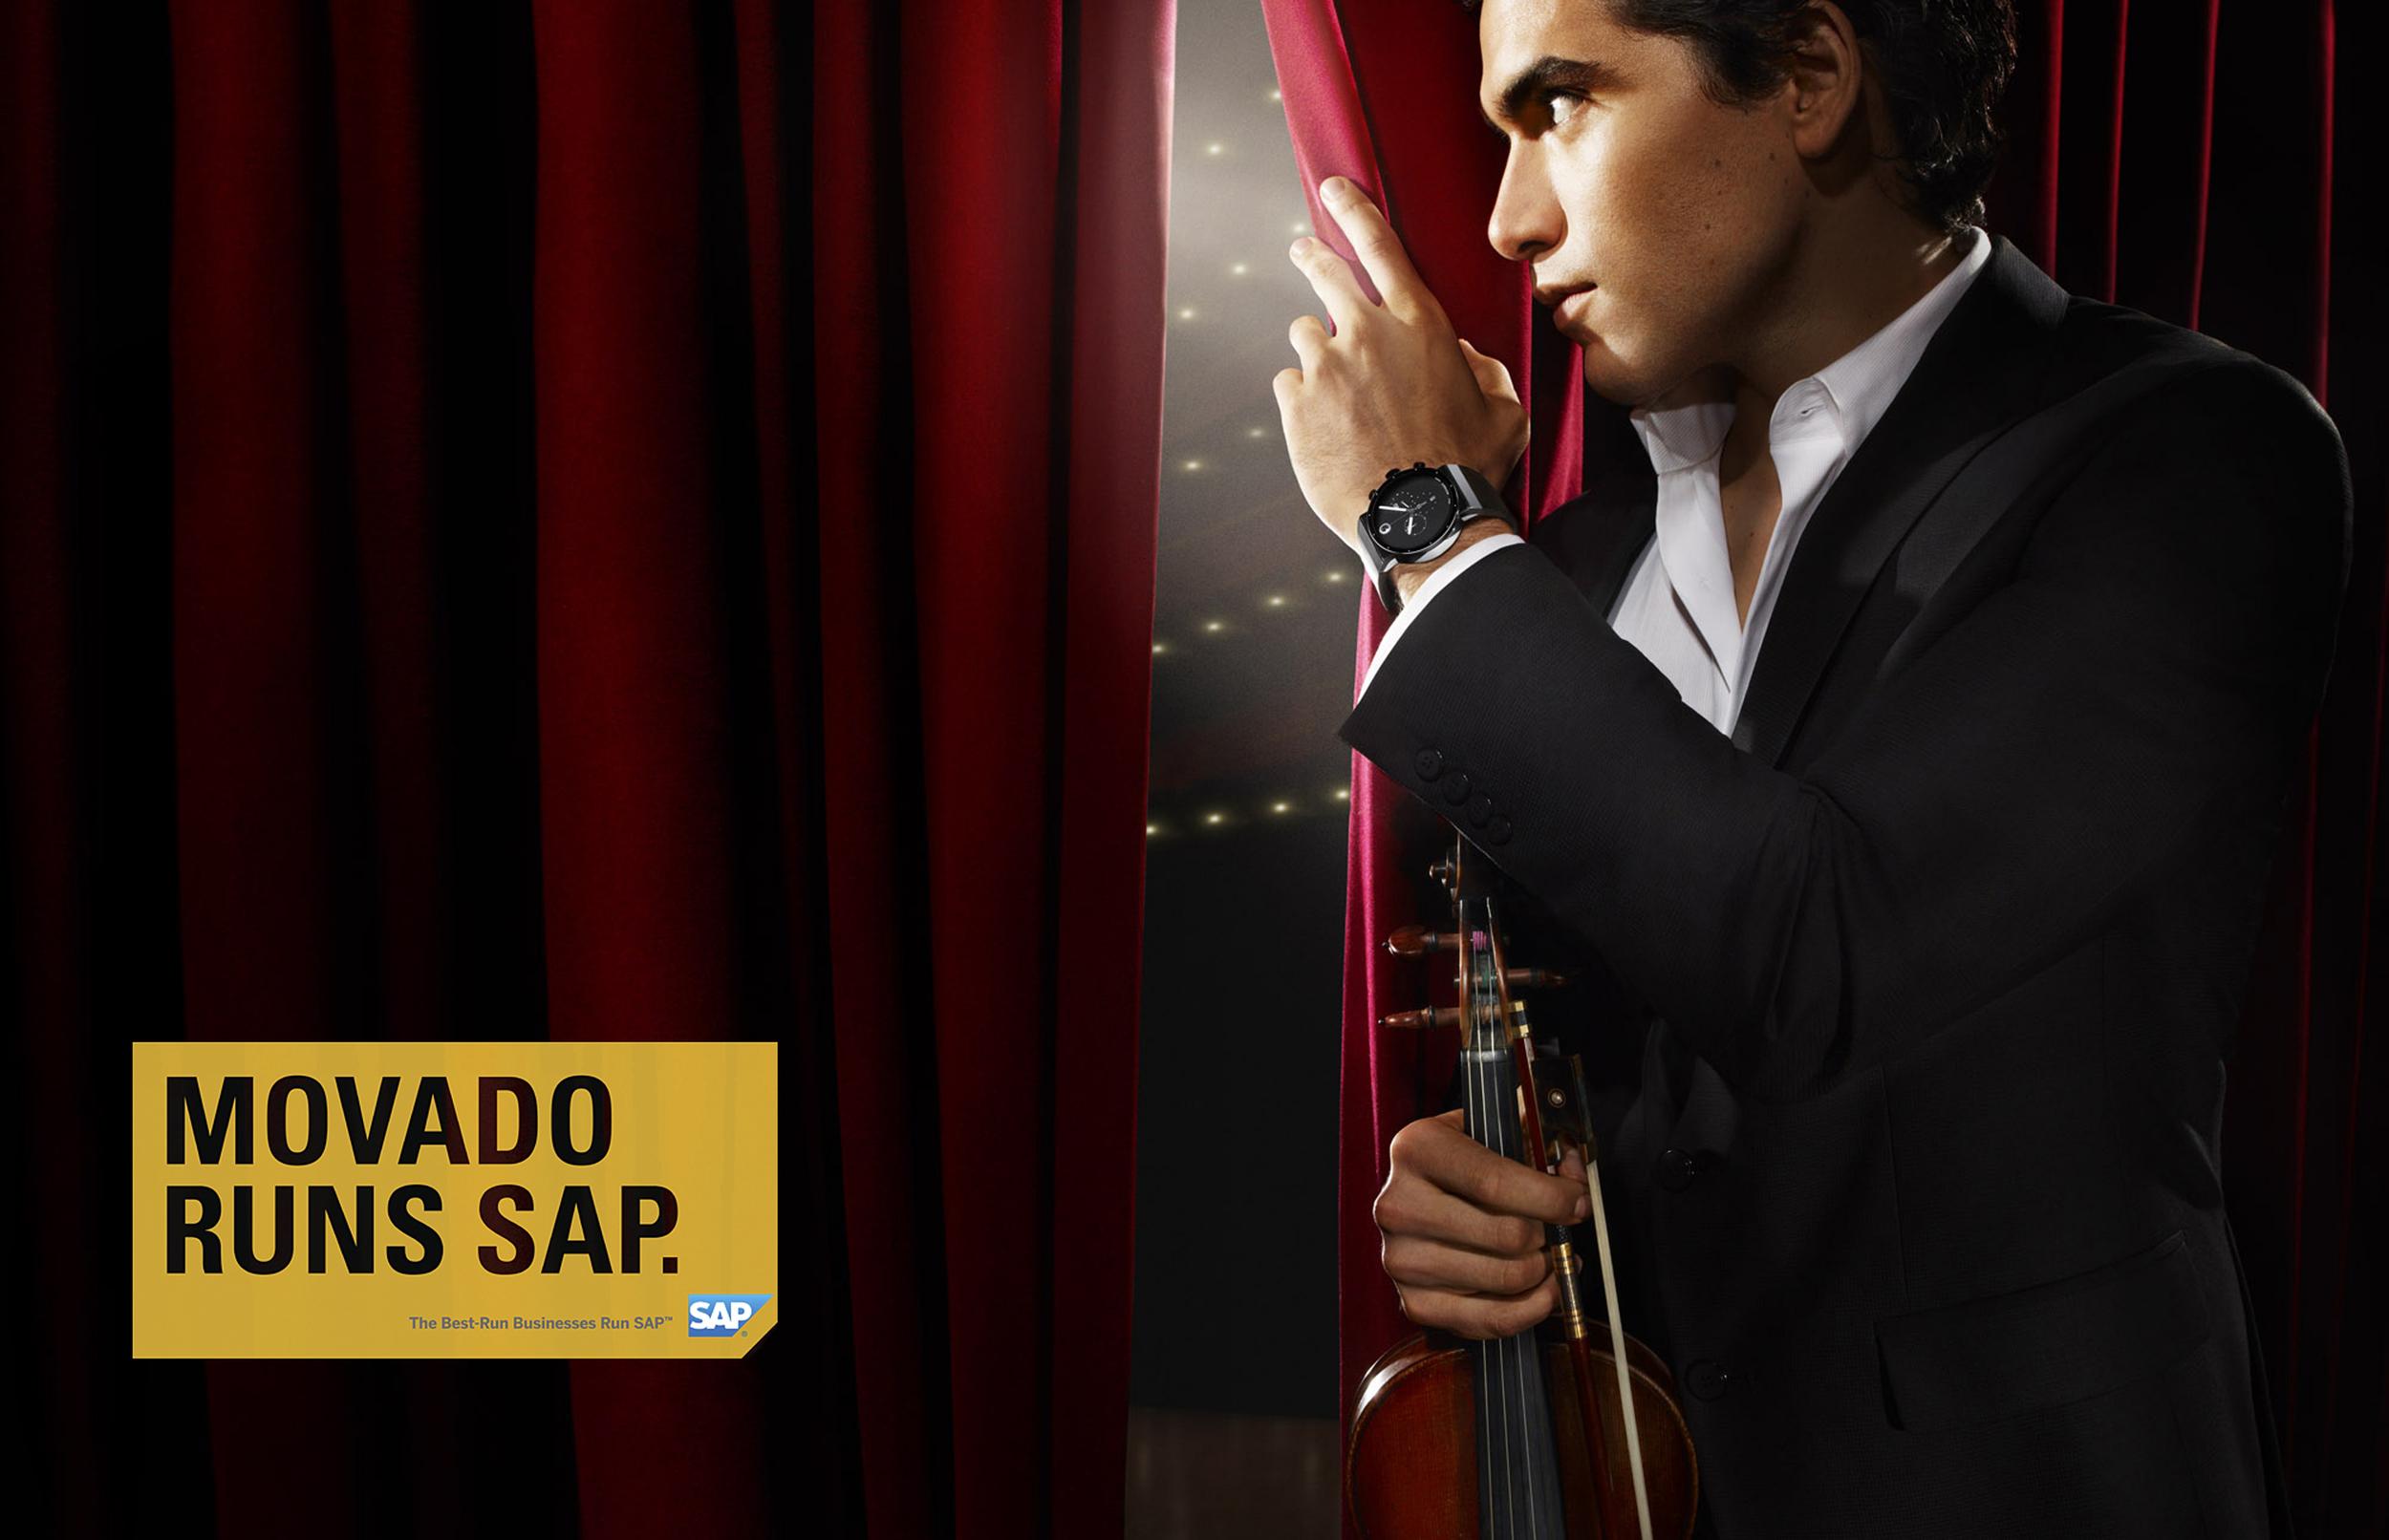 Movado / SAP - New York CIty